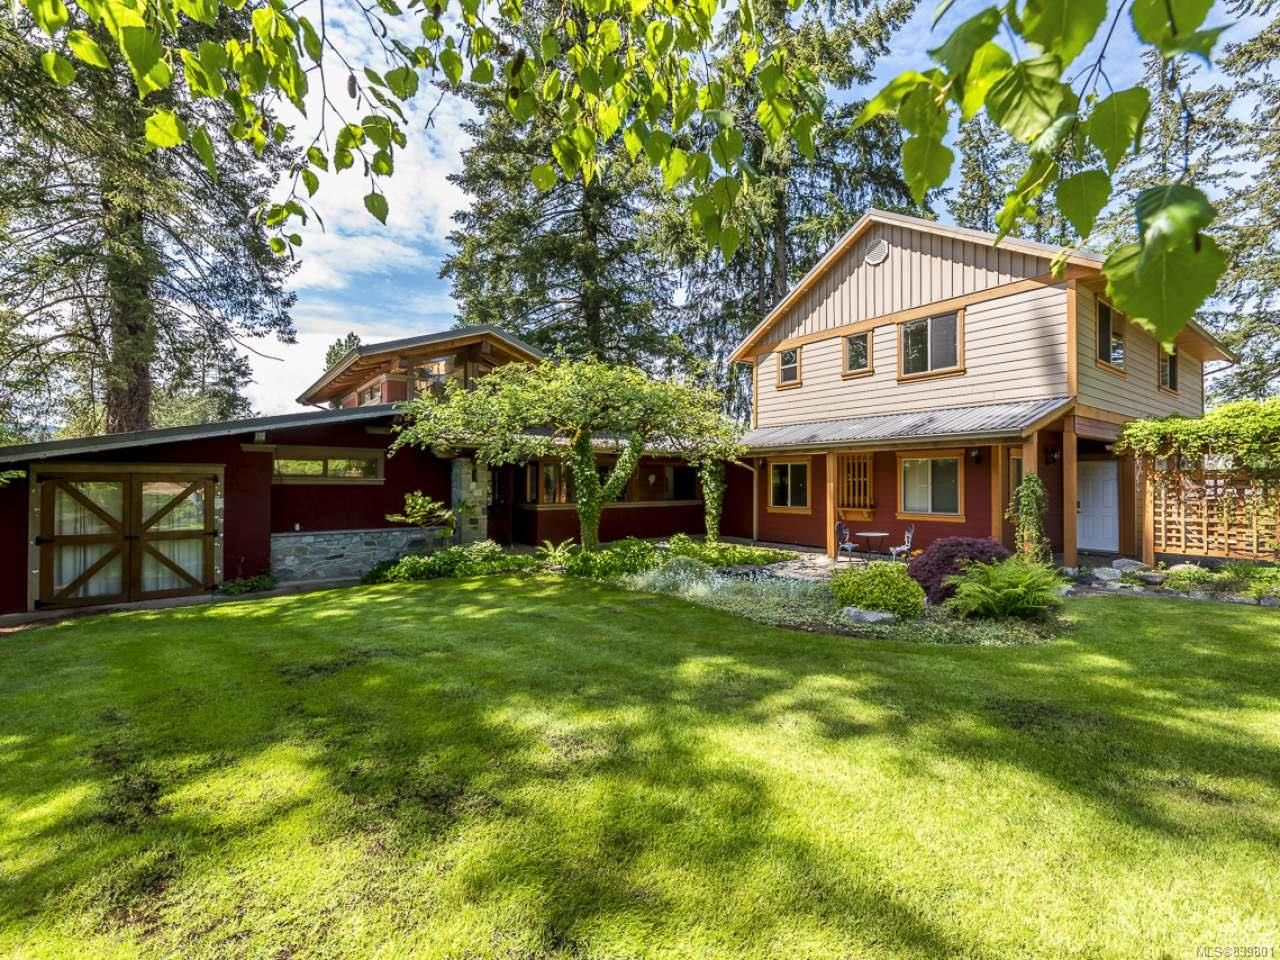 Main Photo: 7511 Howard Rd in MERVILLE: CV Merville Black Creek House for sale (Comox Valley)  : MLS®# 839801